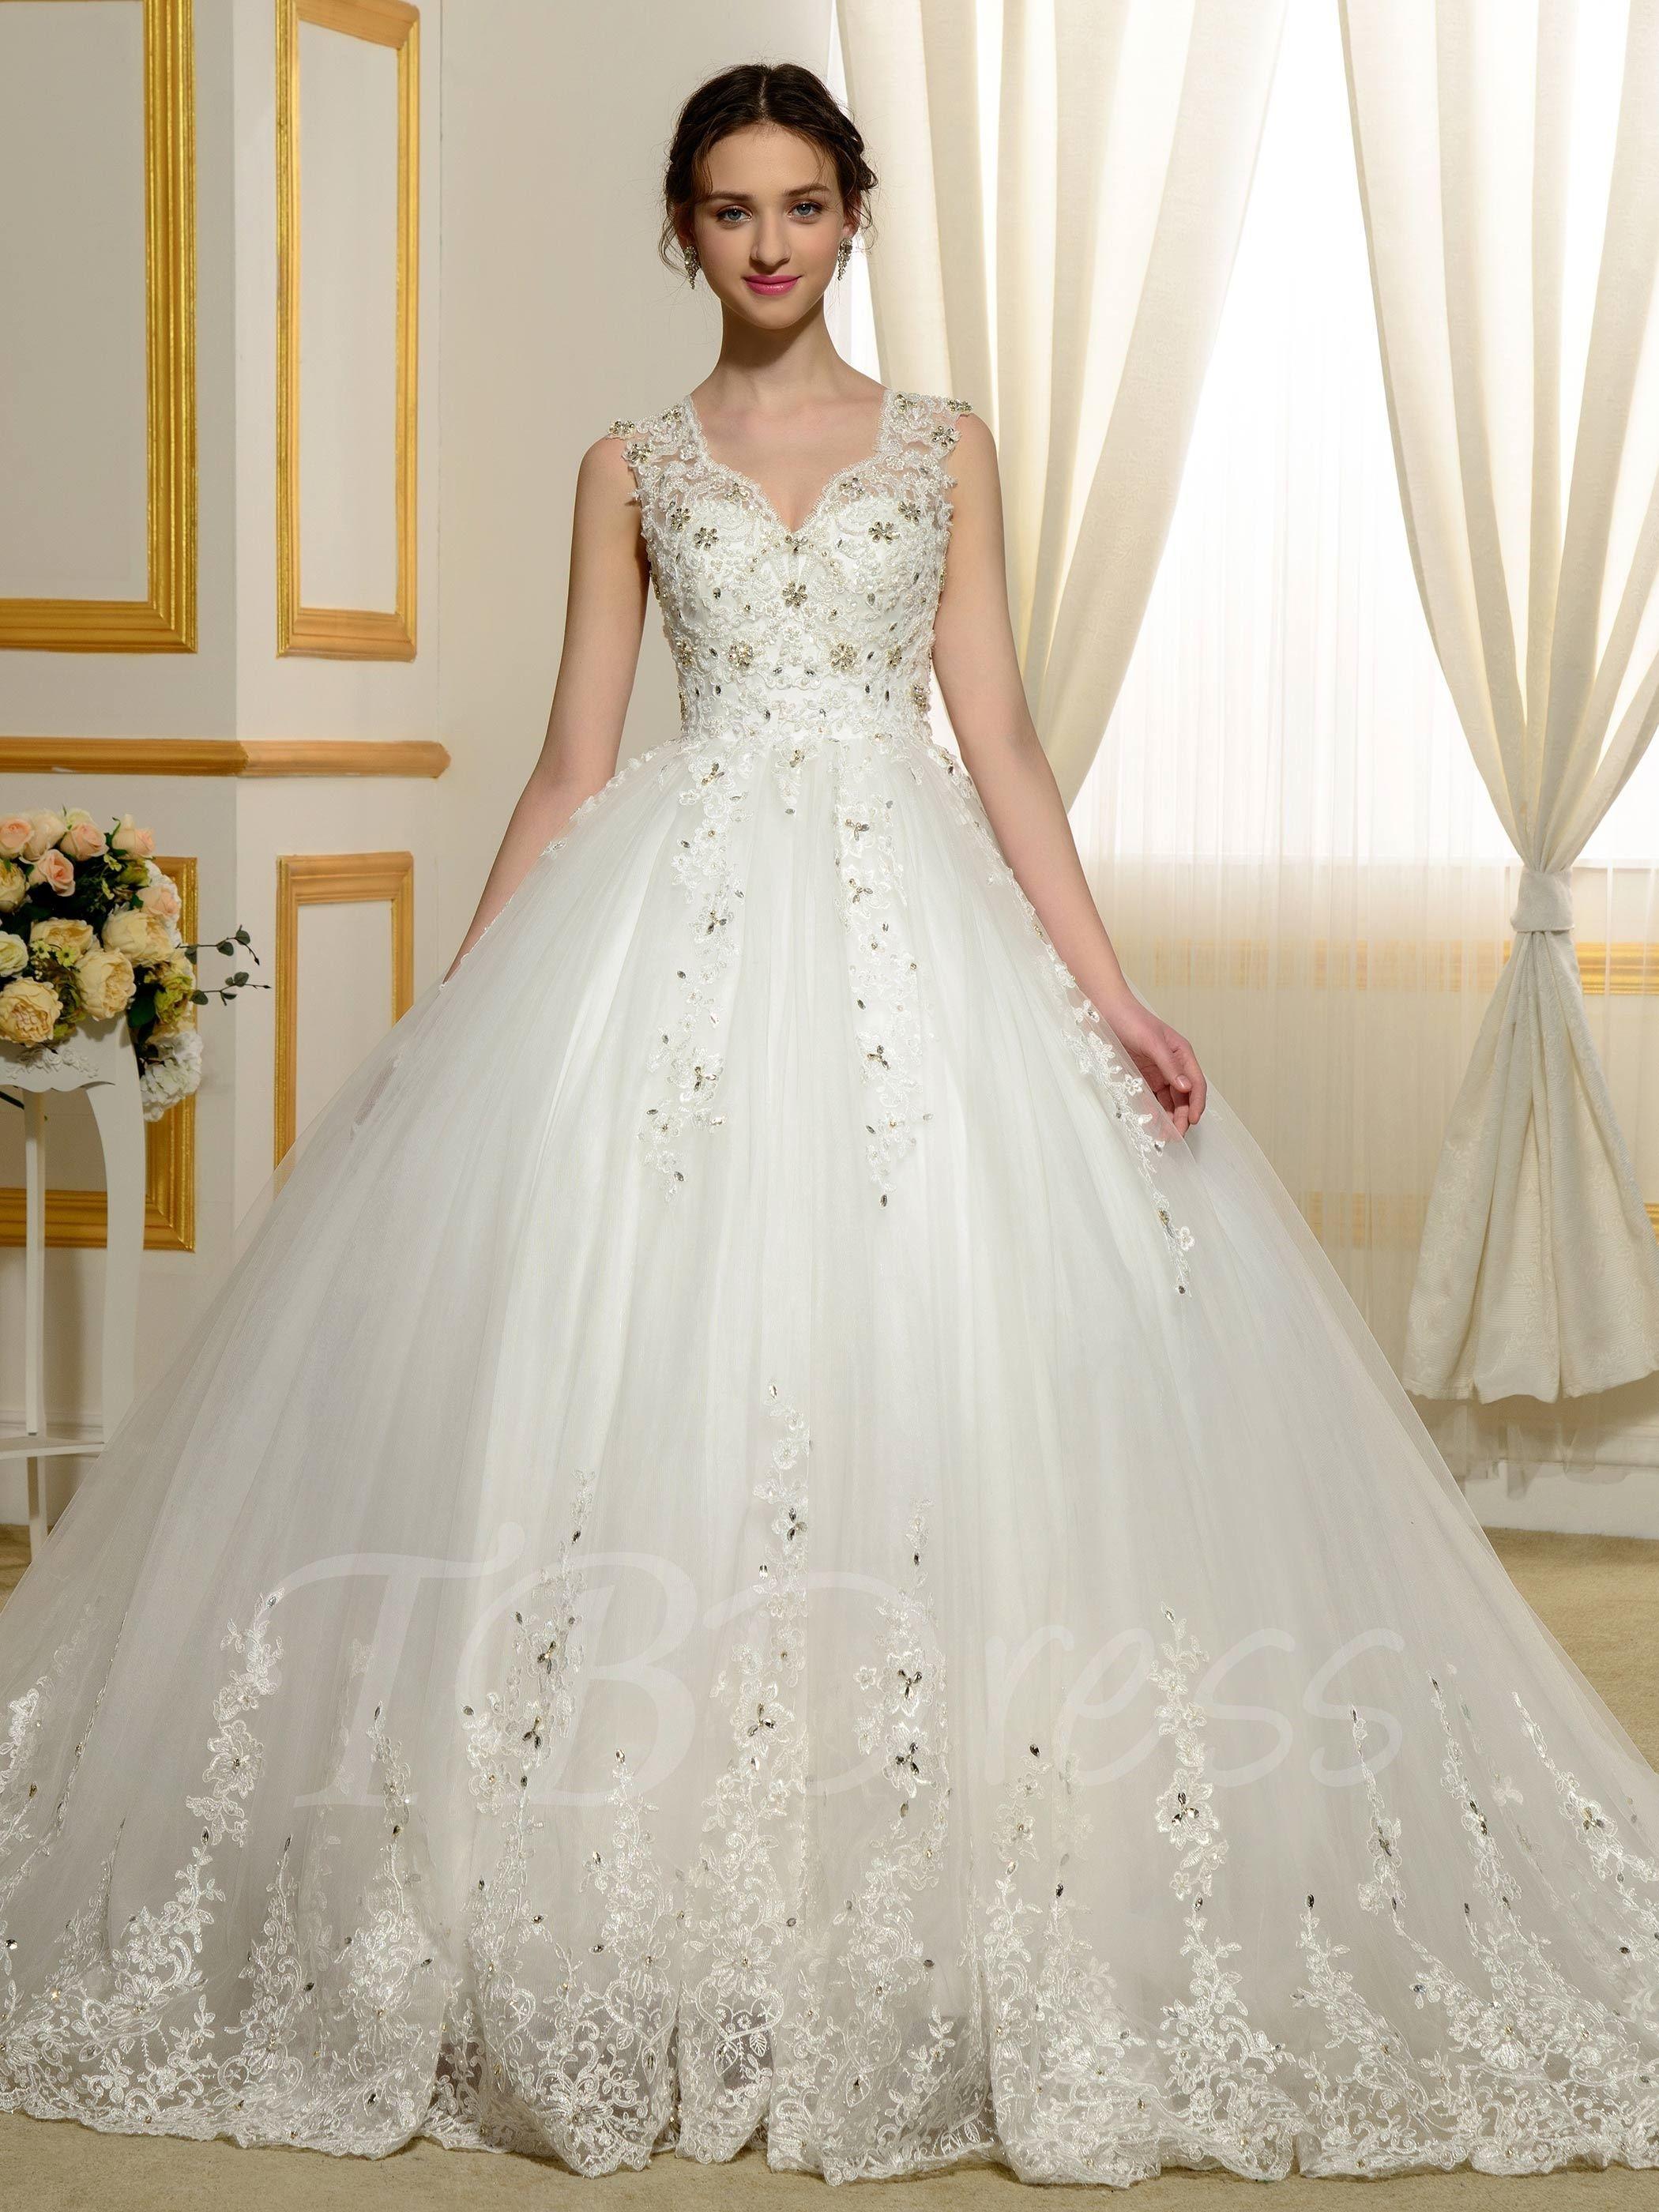 Designer v neck beading appliques lace ball gown wedding dress designer v neck beading appliques lace ball gown wedding dress ombrellifo Choice Image